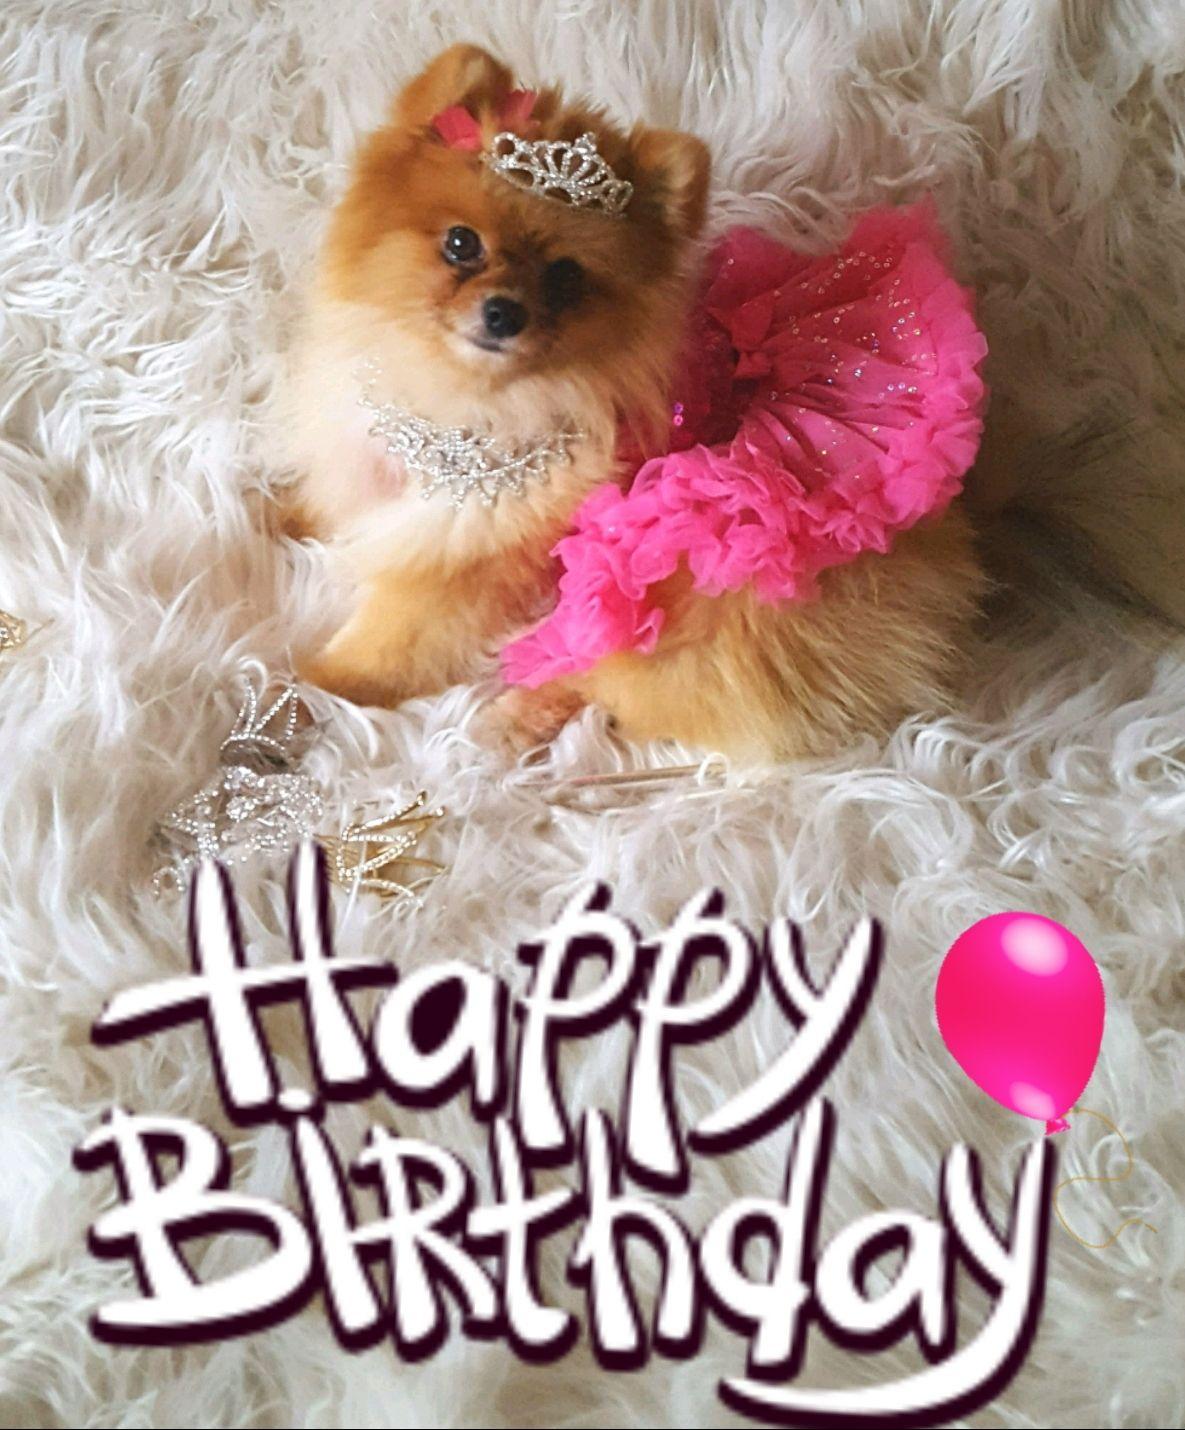 Happy Birthday Pomeranian! Happy birthday images